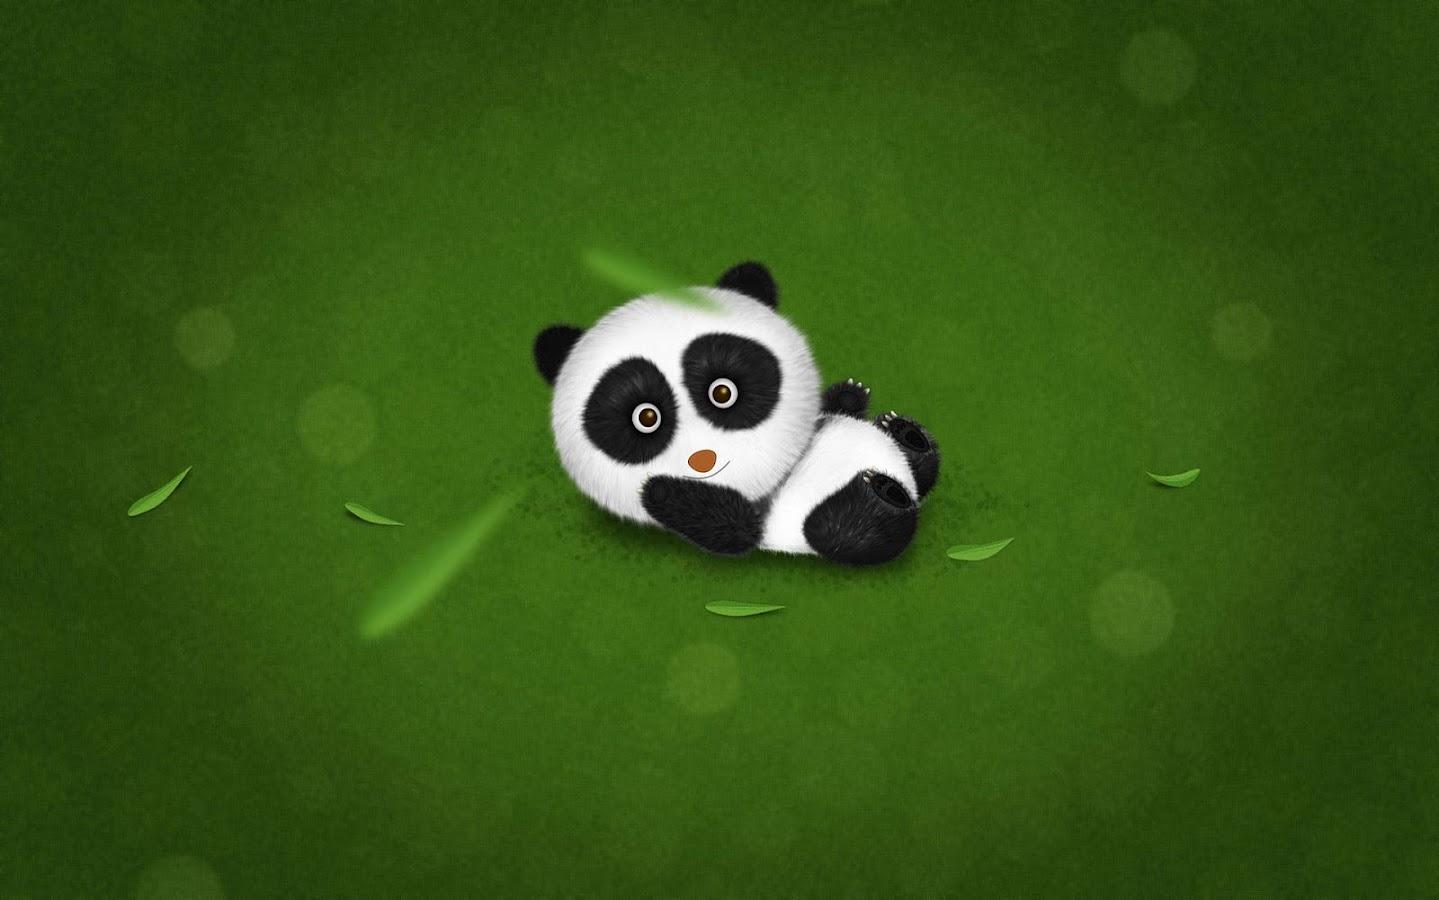 100 Panda Wallpaper Red Panda Wallpaper Free Hd Backgrounds